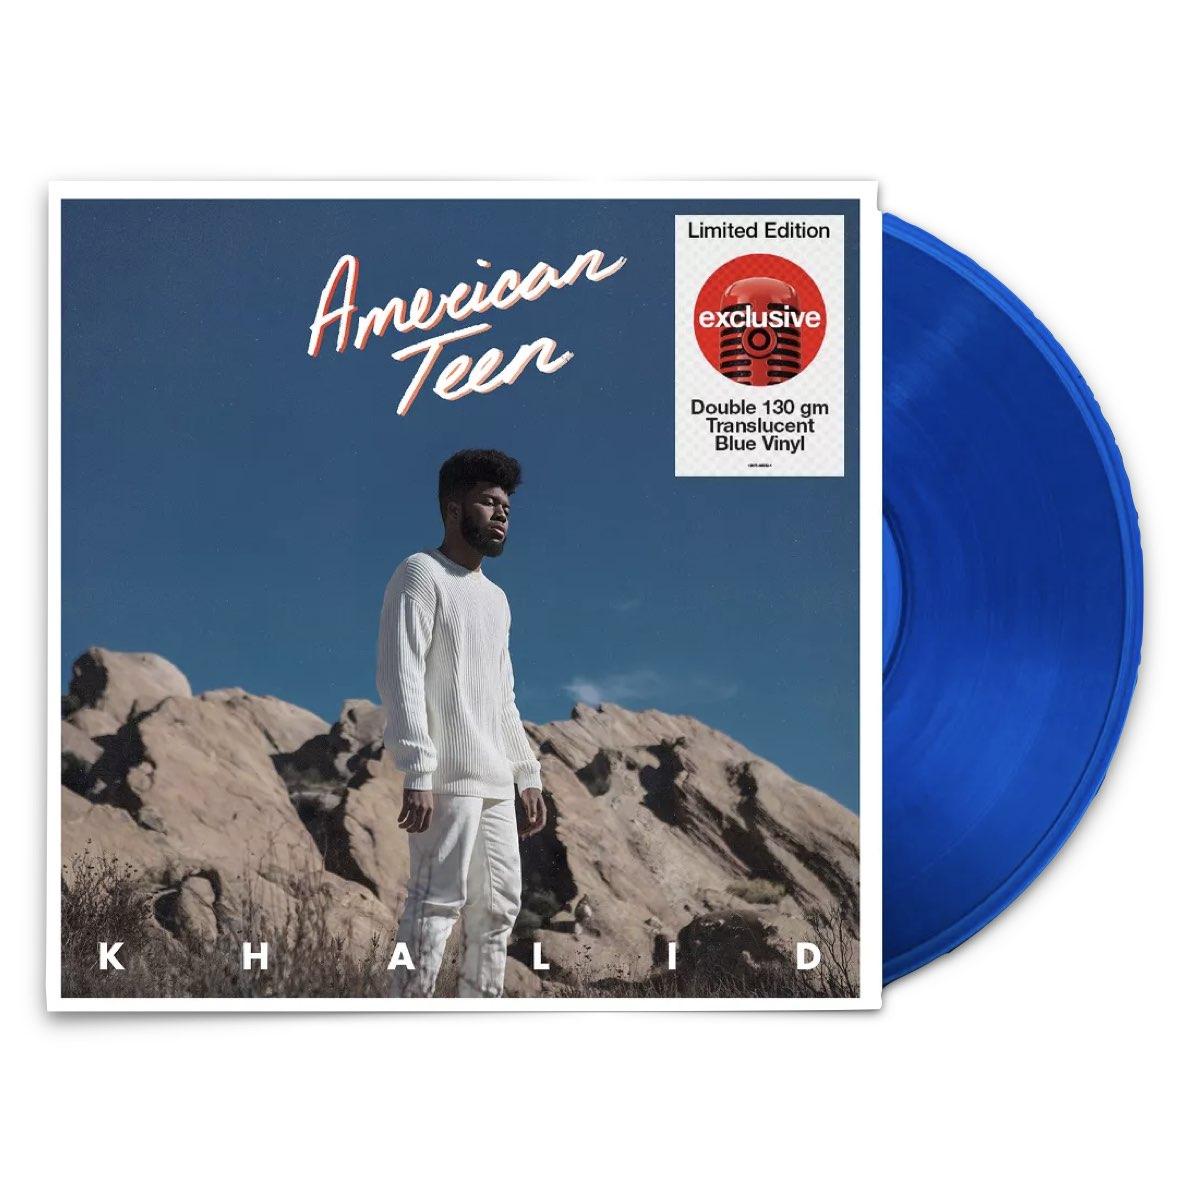 Khalid - American Teen [Target Exclusive, Double Translucent Blue Vinyl]